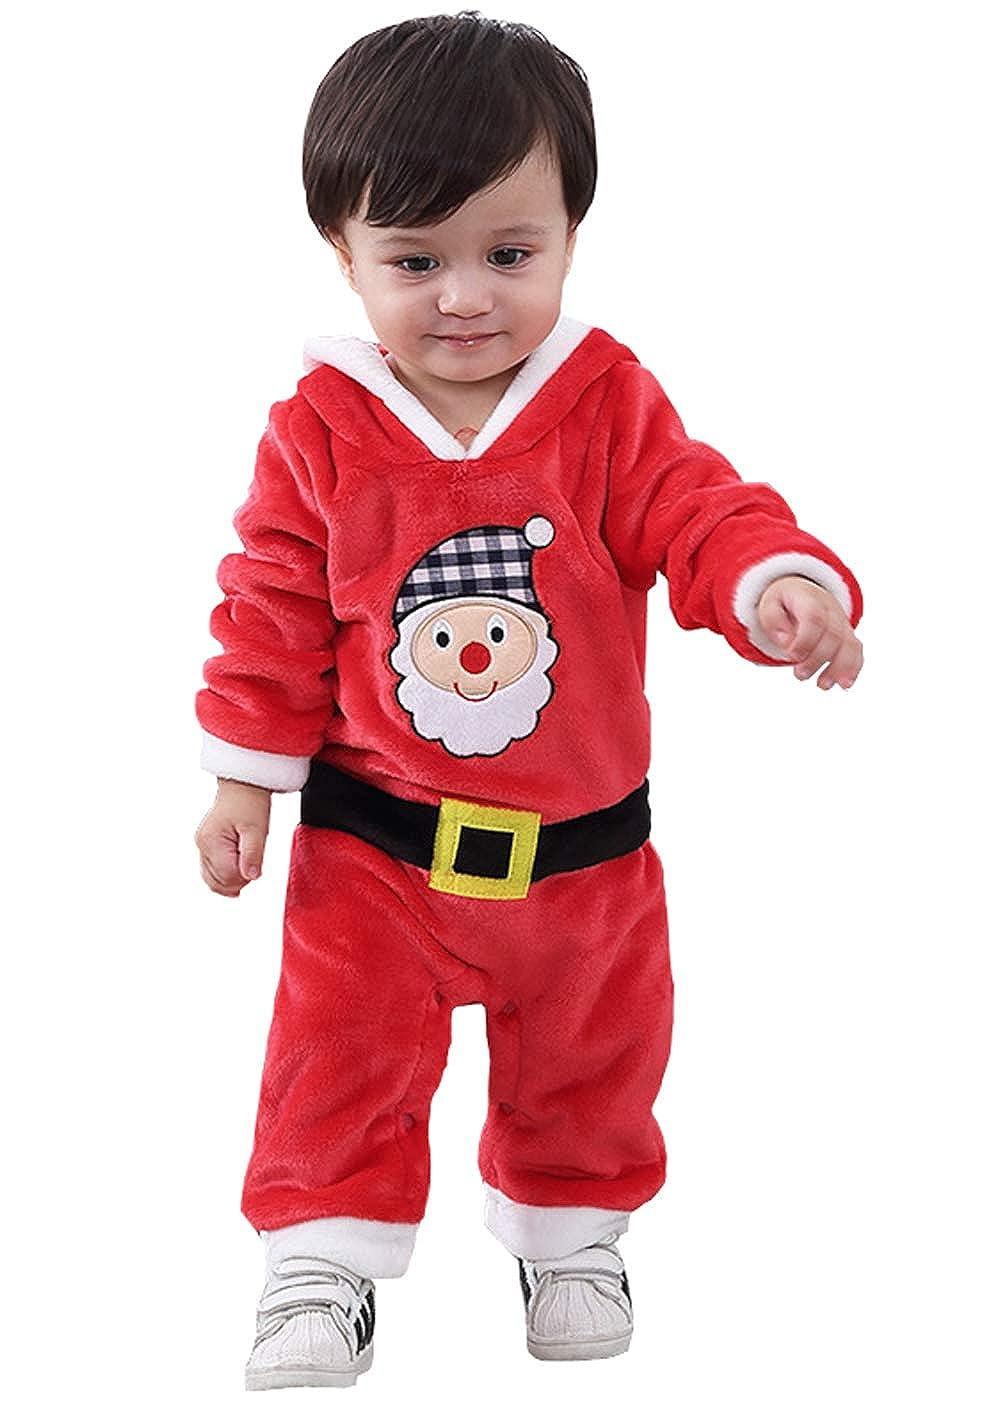 cool elves - Mono Romper para Bebés de 3-18 Meses Disfraces de Navidad Papá Noel con Capucha Suave de Franela - Rojo - 3-18 Meses